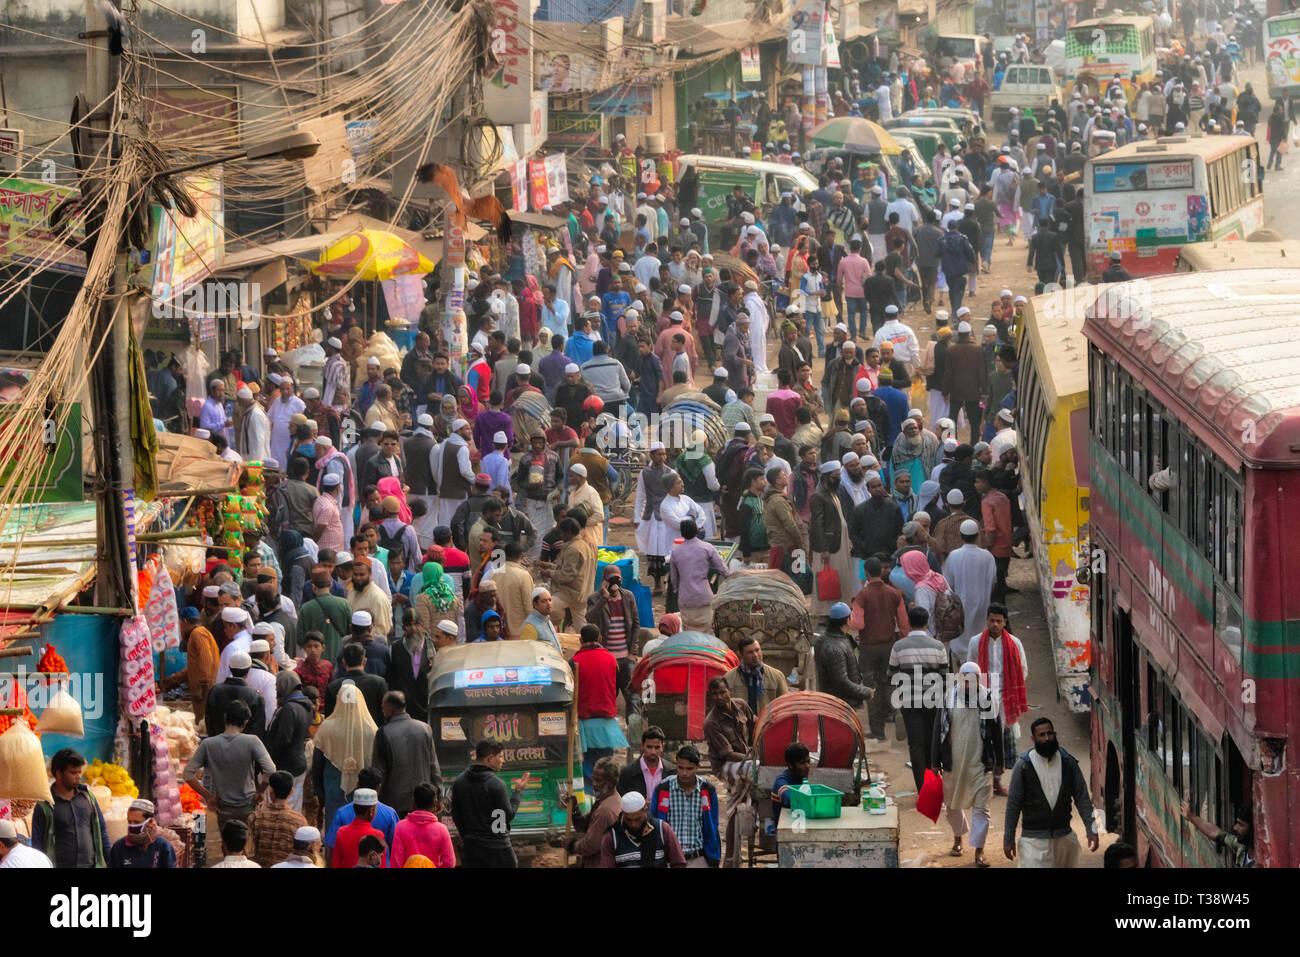 Busy street with crowds of people and buses, Dhaka, Bangladesh - Stock Image